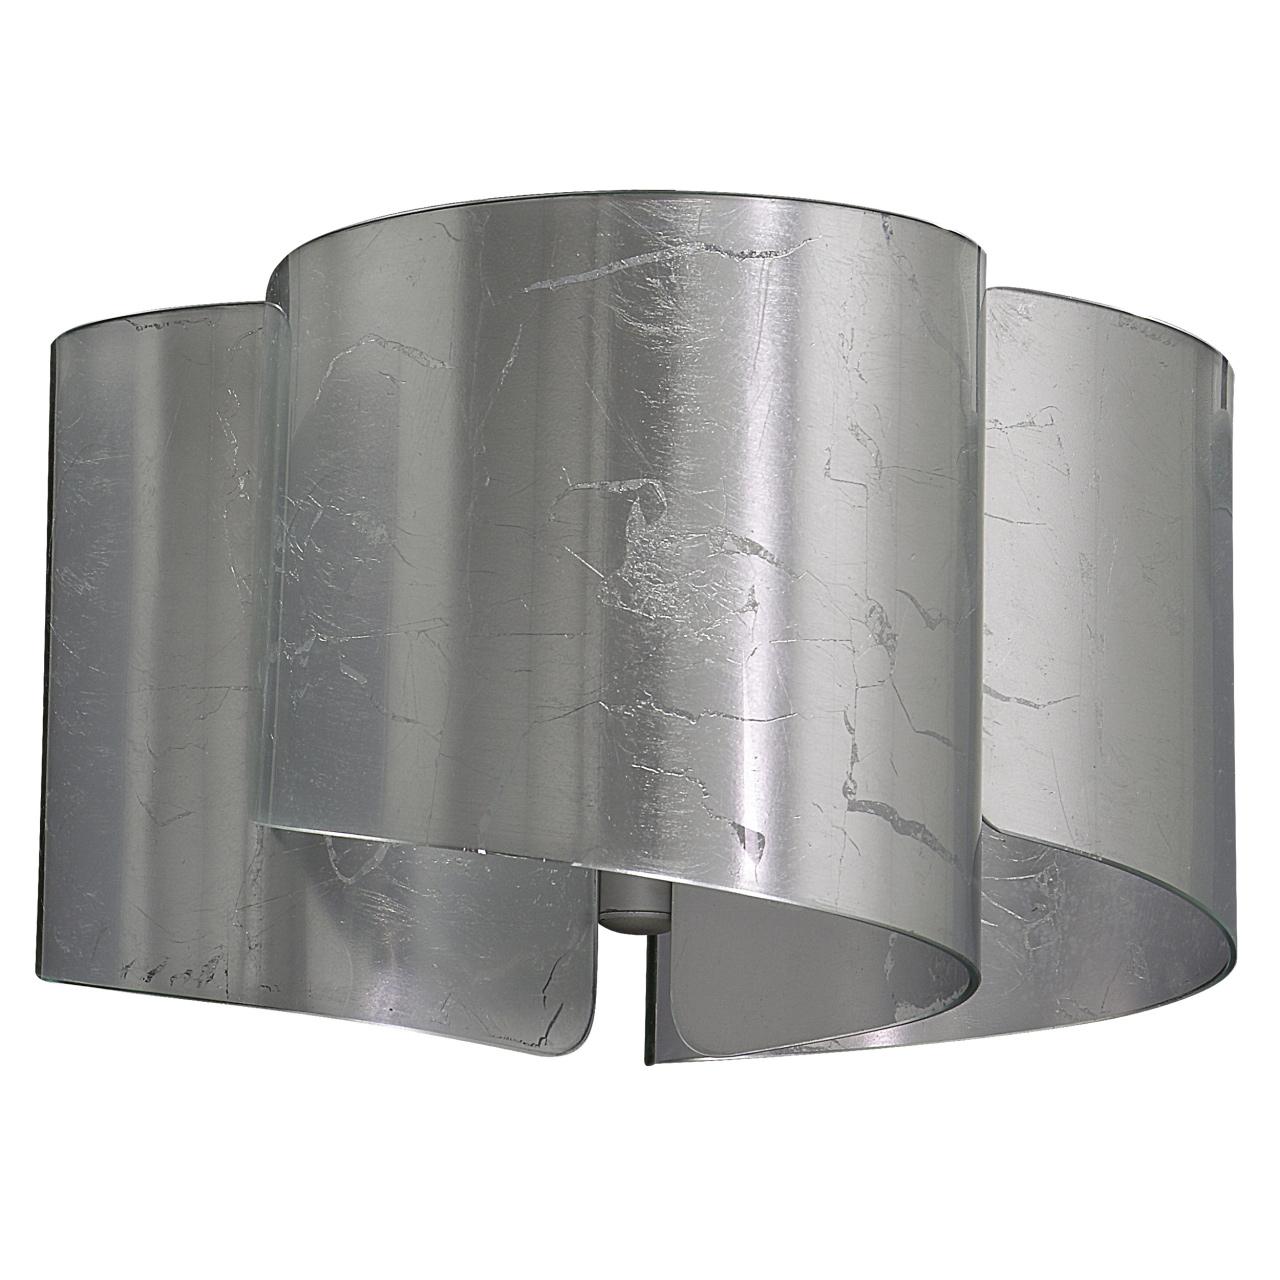 Люстра потолочная Pittore 3х40W E27 silver Lightstar 811034